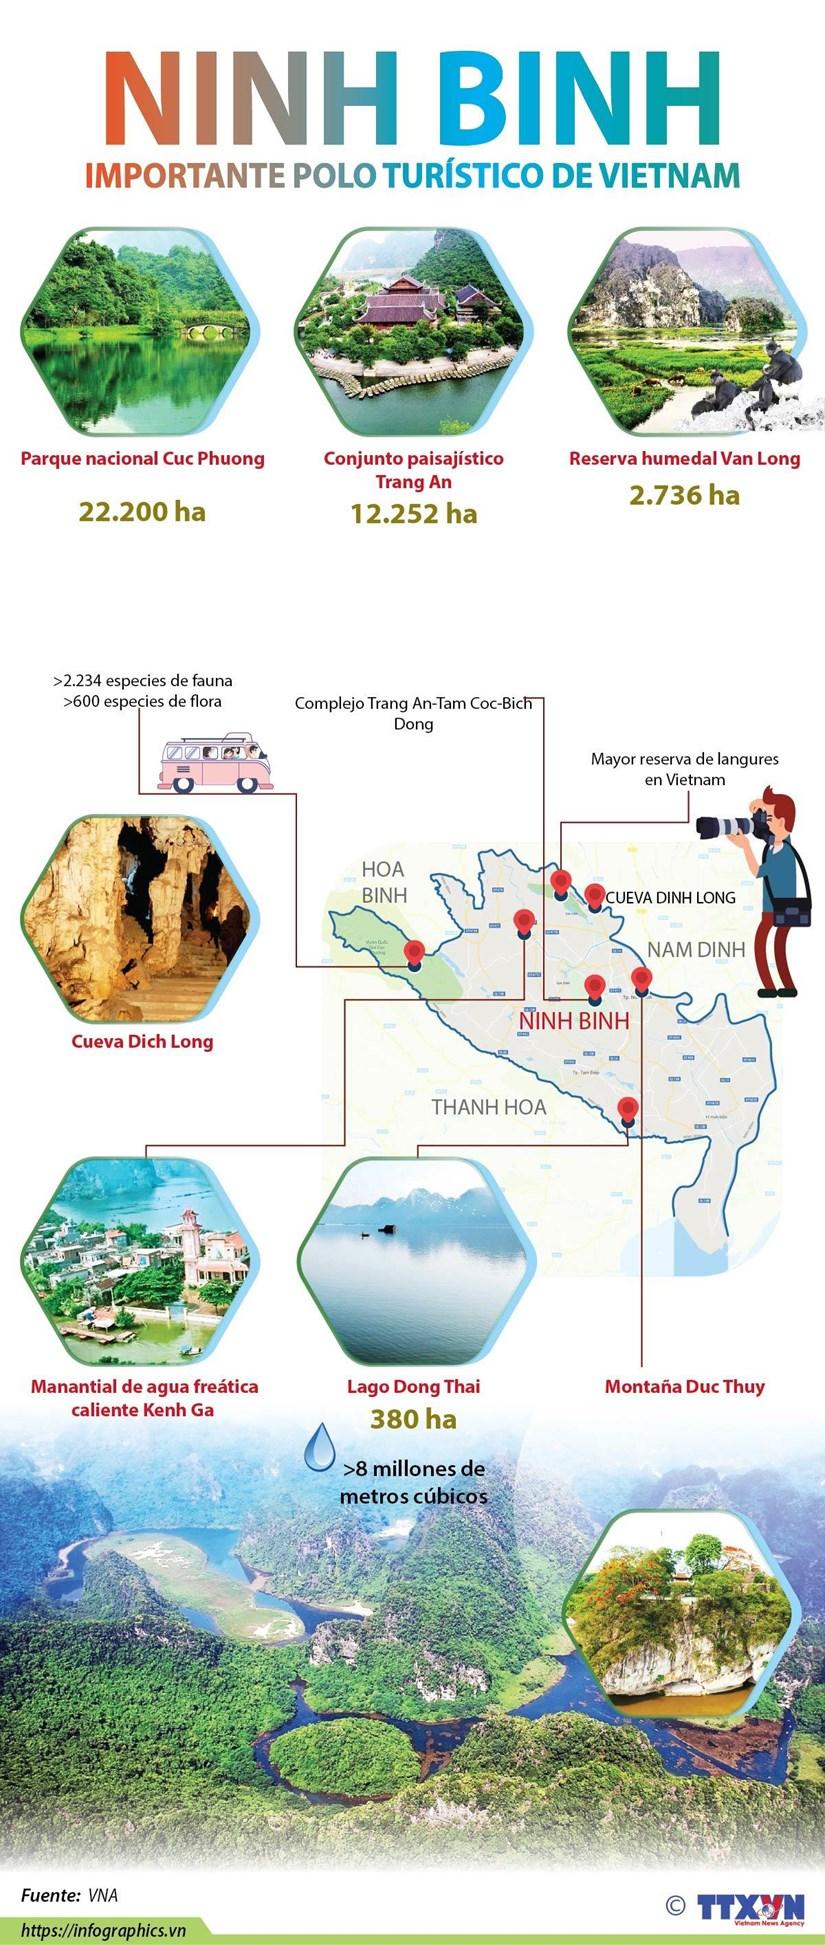 [Info] Ninh Binh, importante polo turistico de Vietnam hinh anh 1